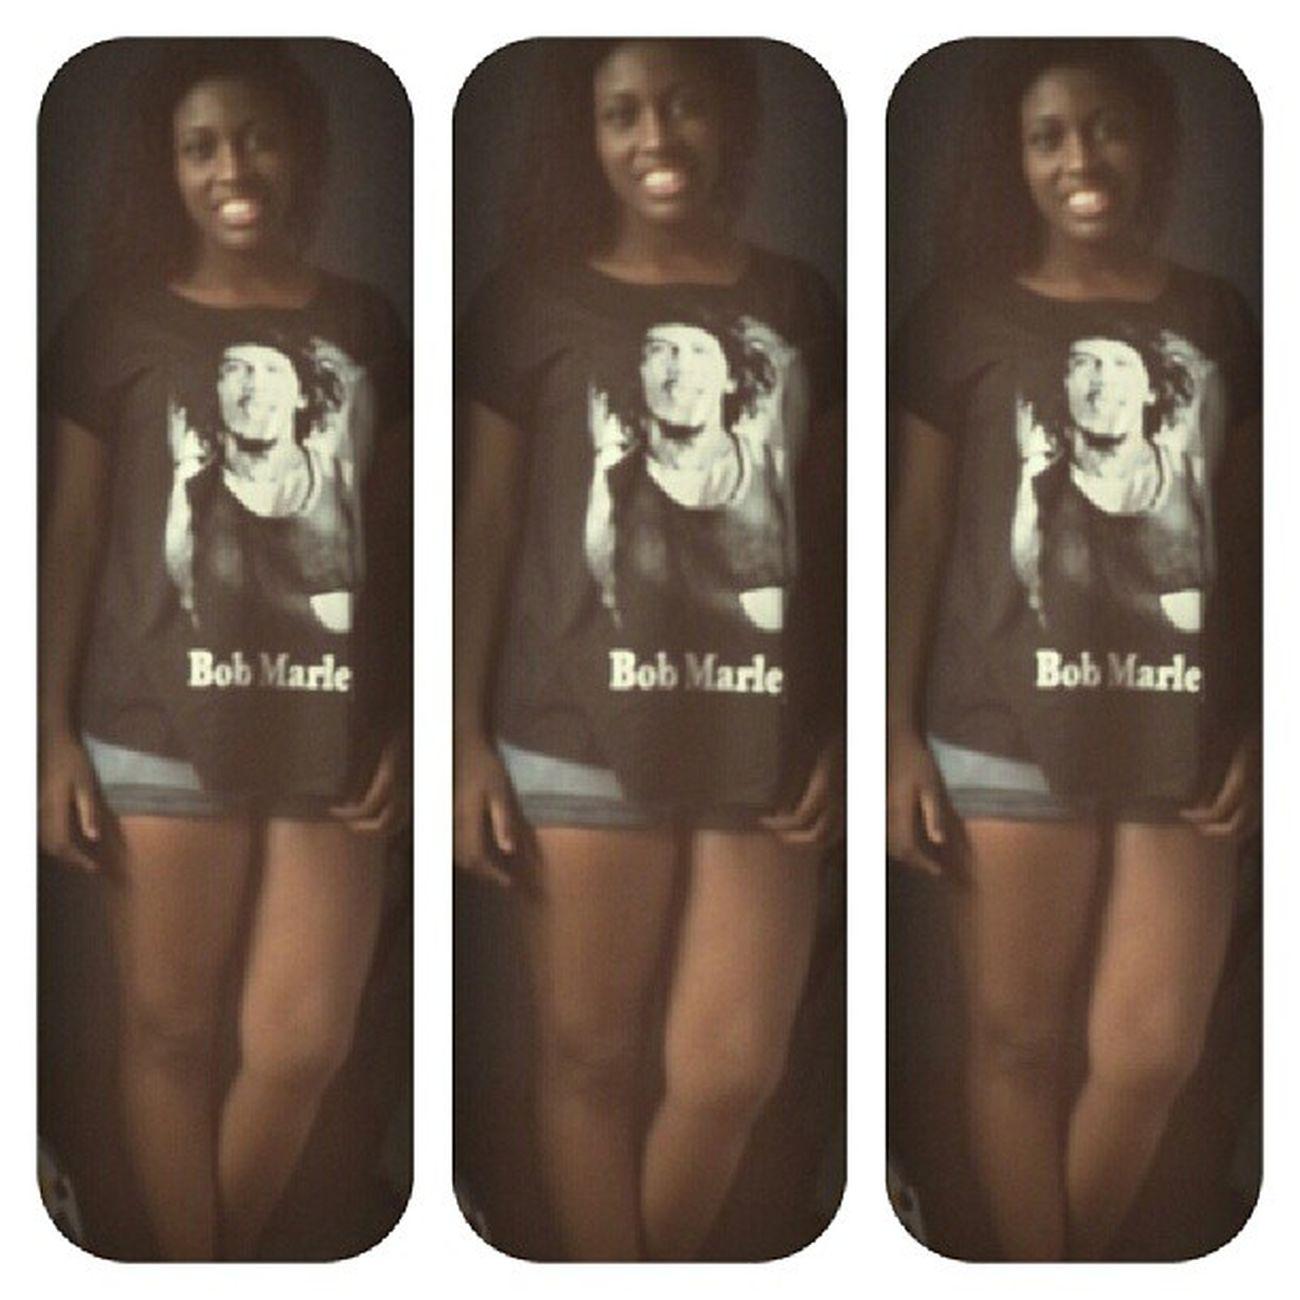 One love, one heart ,let's get together and feel all right ! Bobmarley Reggae Kingofreggae OneLove rastaman jamaica love legend rasta rastafari marley dreadlocks marleyfamily marijuana dreads mancrushmonday trenchtown music lion jamaicanmusic norvalmarley bob reggaelegend rastafarian forever michaeljackson relax tupac ganja thewailers